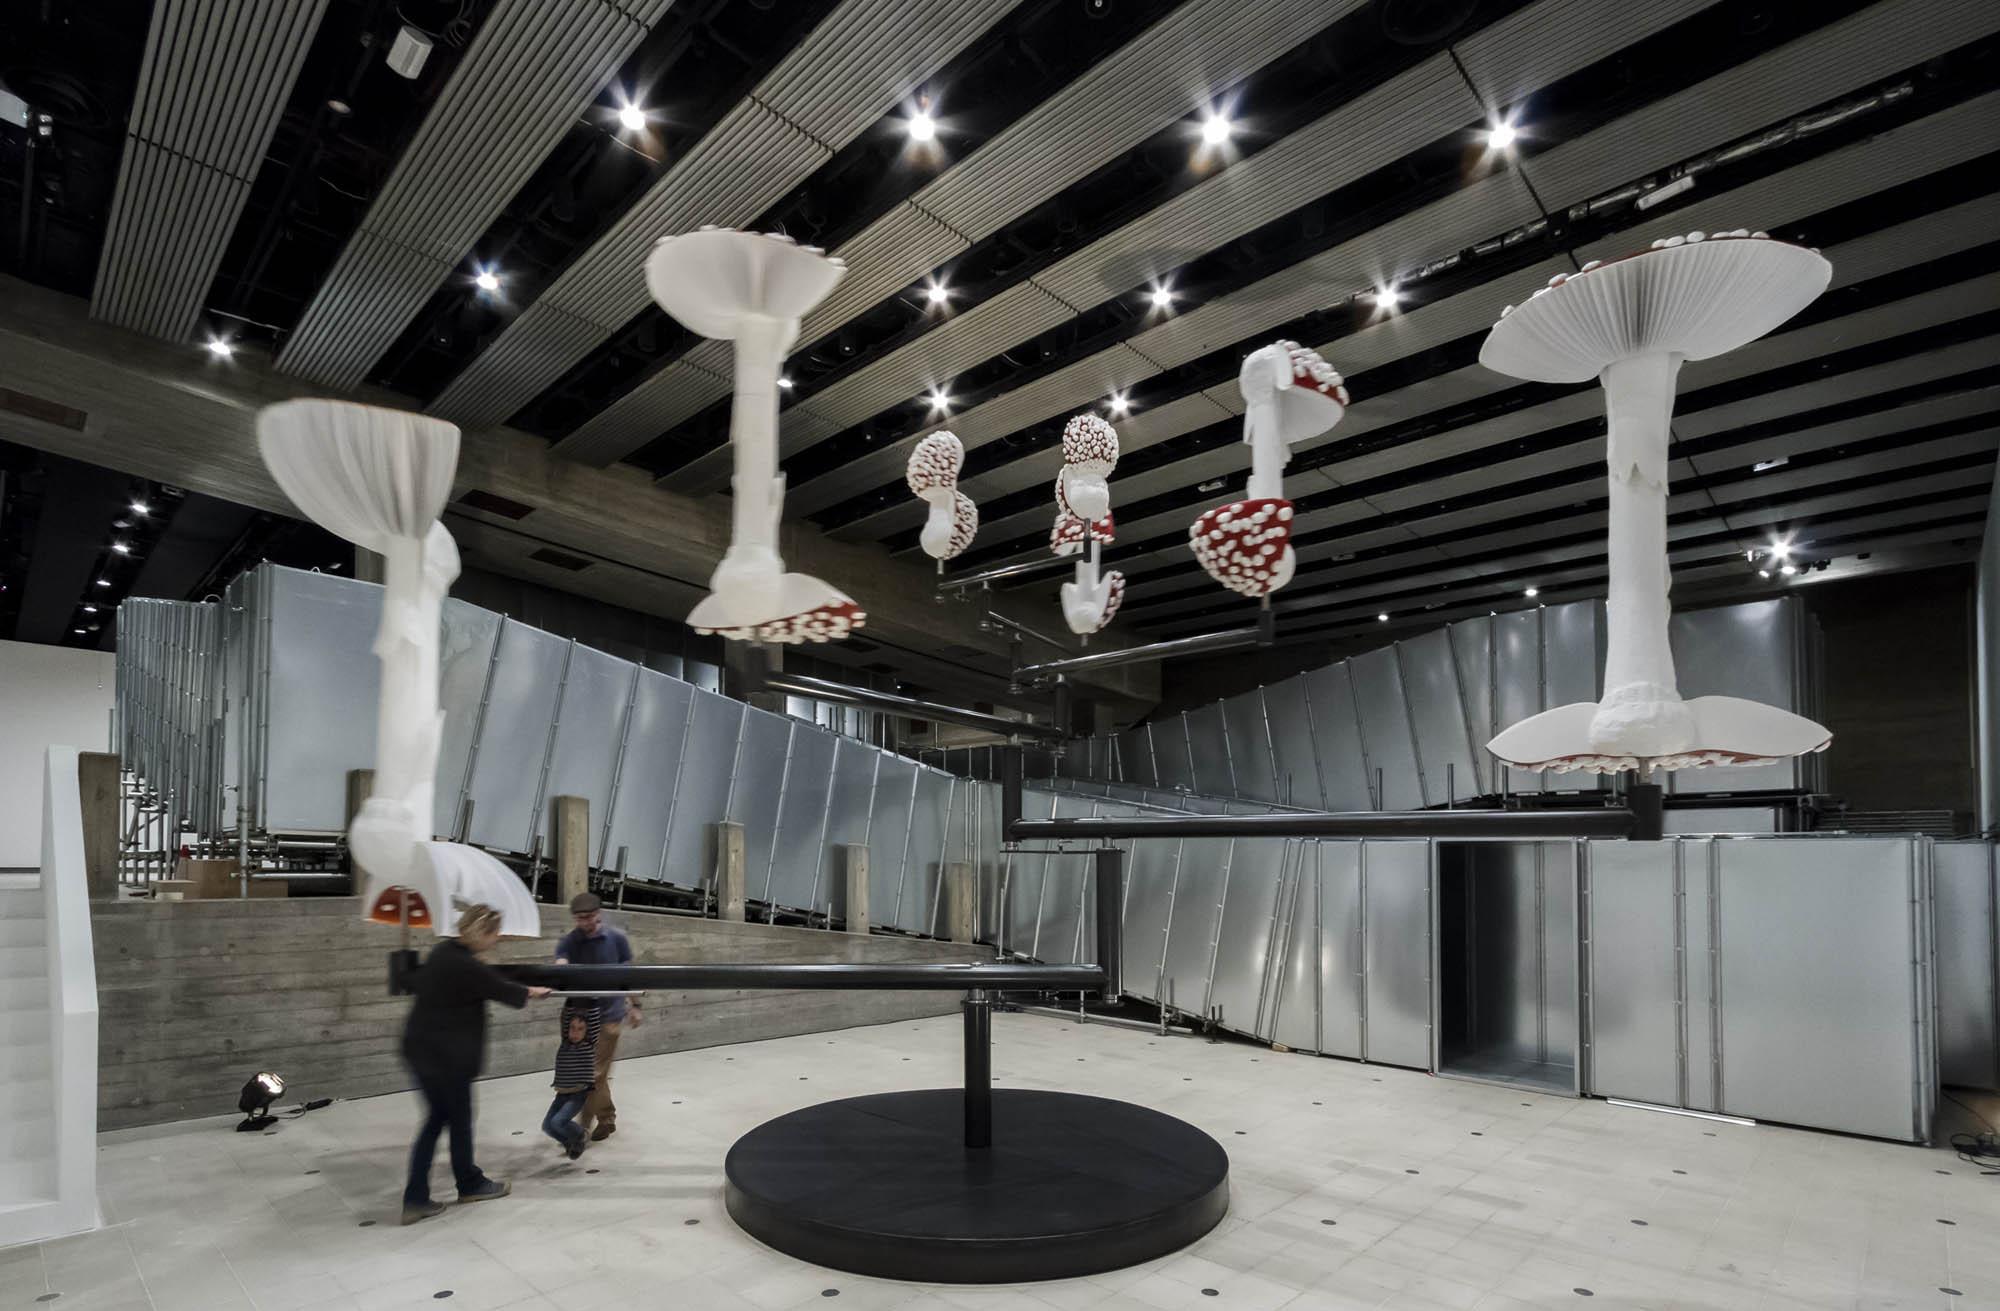 "Carsten Höller, Flying Mushrooms, 2015, Installation view, ""Carsten Höller: Decision,"" Hayward Gallery, London, 2015 Polyester mushroom replicas, polyester paint, synthetic resin, acrylic paint, wire, putty, polyurethane, rigid foam, stainless steel 16' 8 3/8"" × 28' 3 3/8"" × 28' 3 3/8"" (5.1 × 8.6 × 8.6 m) Artwork © Carsten Höller. Photo by Ela Bialkowska. Courtesy Gagosian."